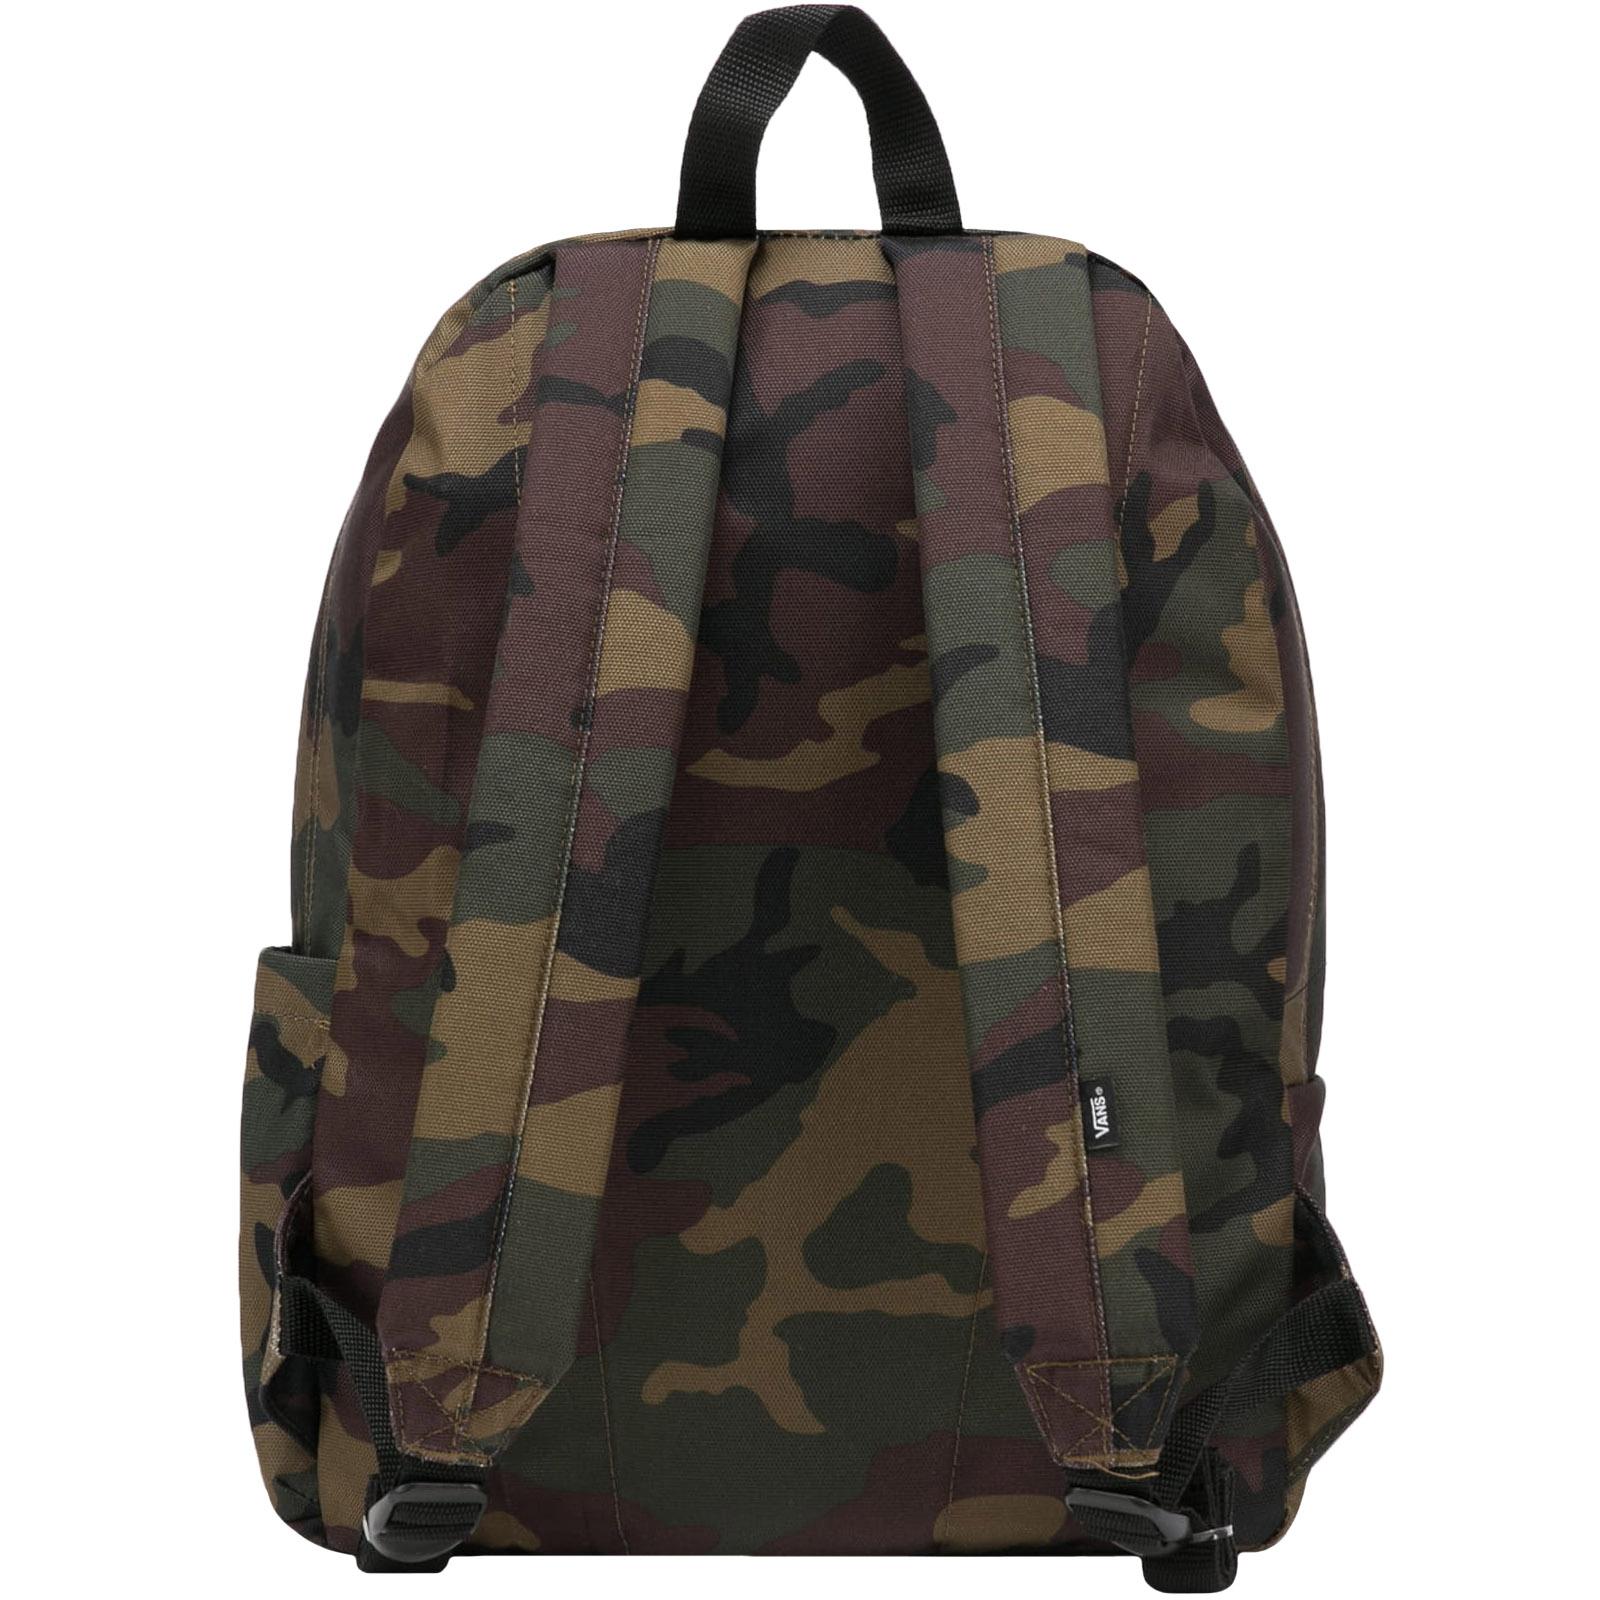 thumbnail 3 - Vans Unisex Old Skool III Adjustable Strap School Travel Rucksack Backpack Bag